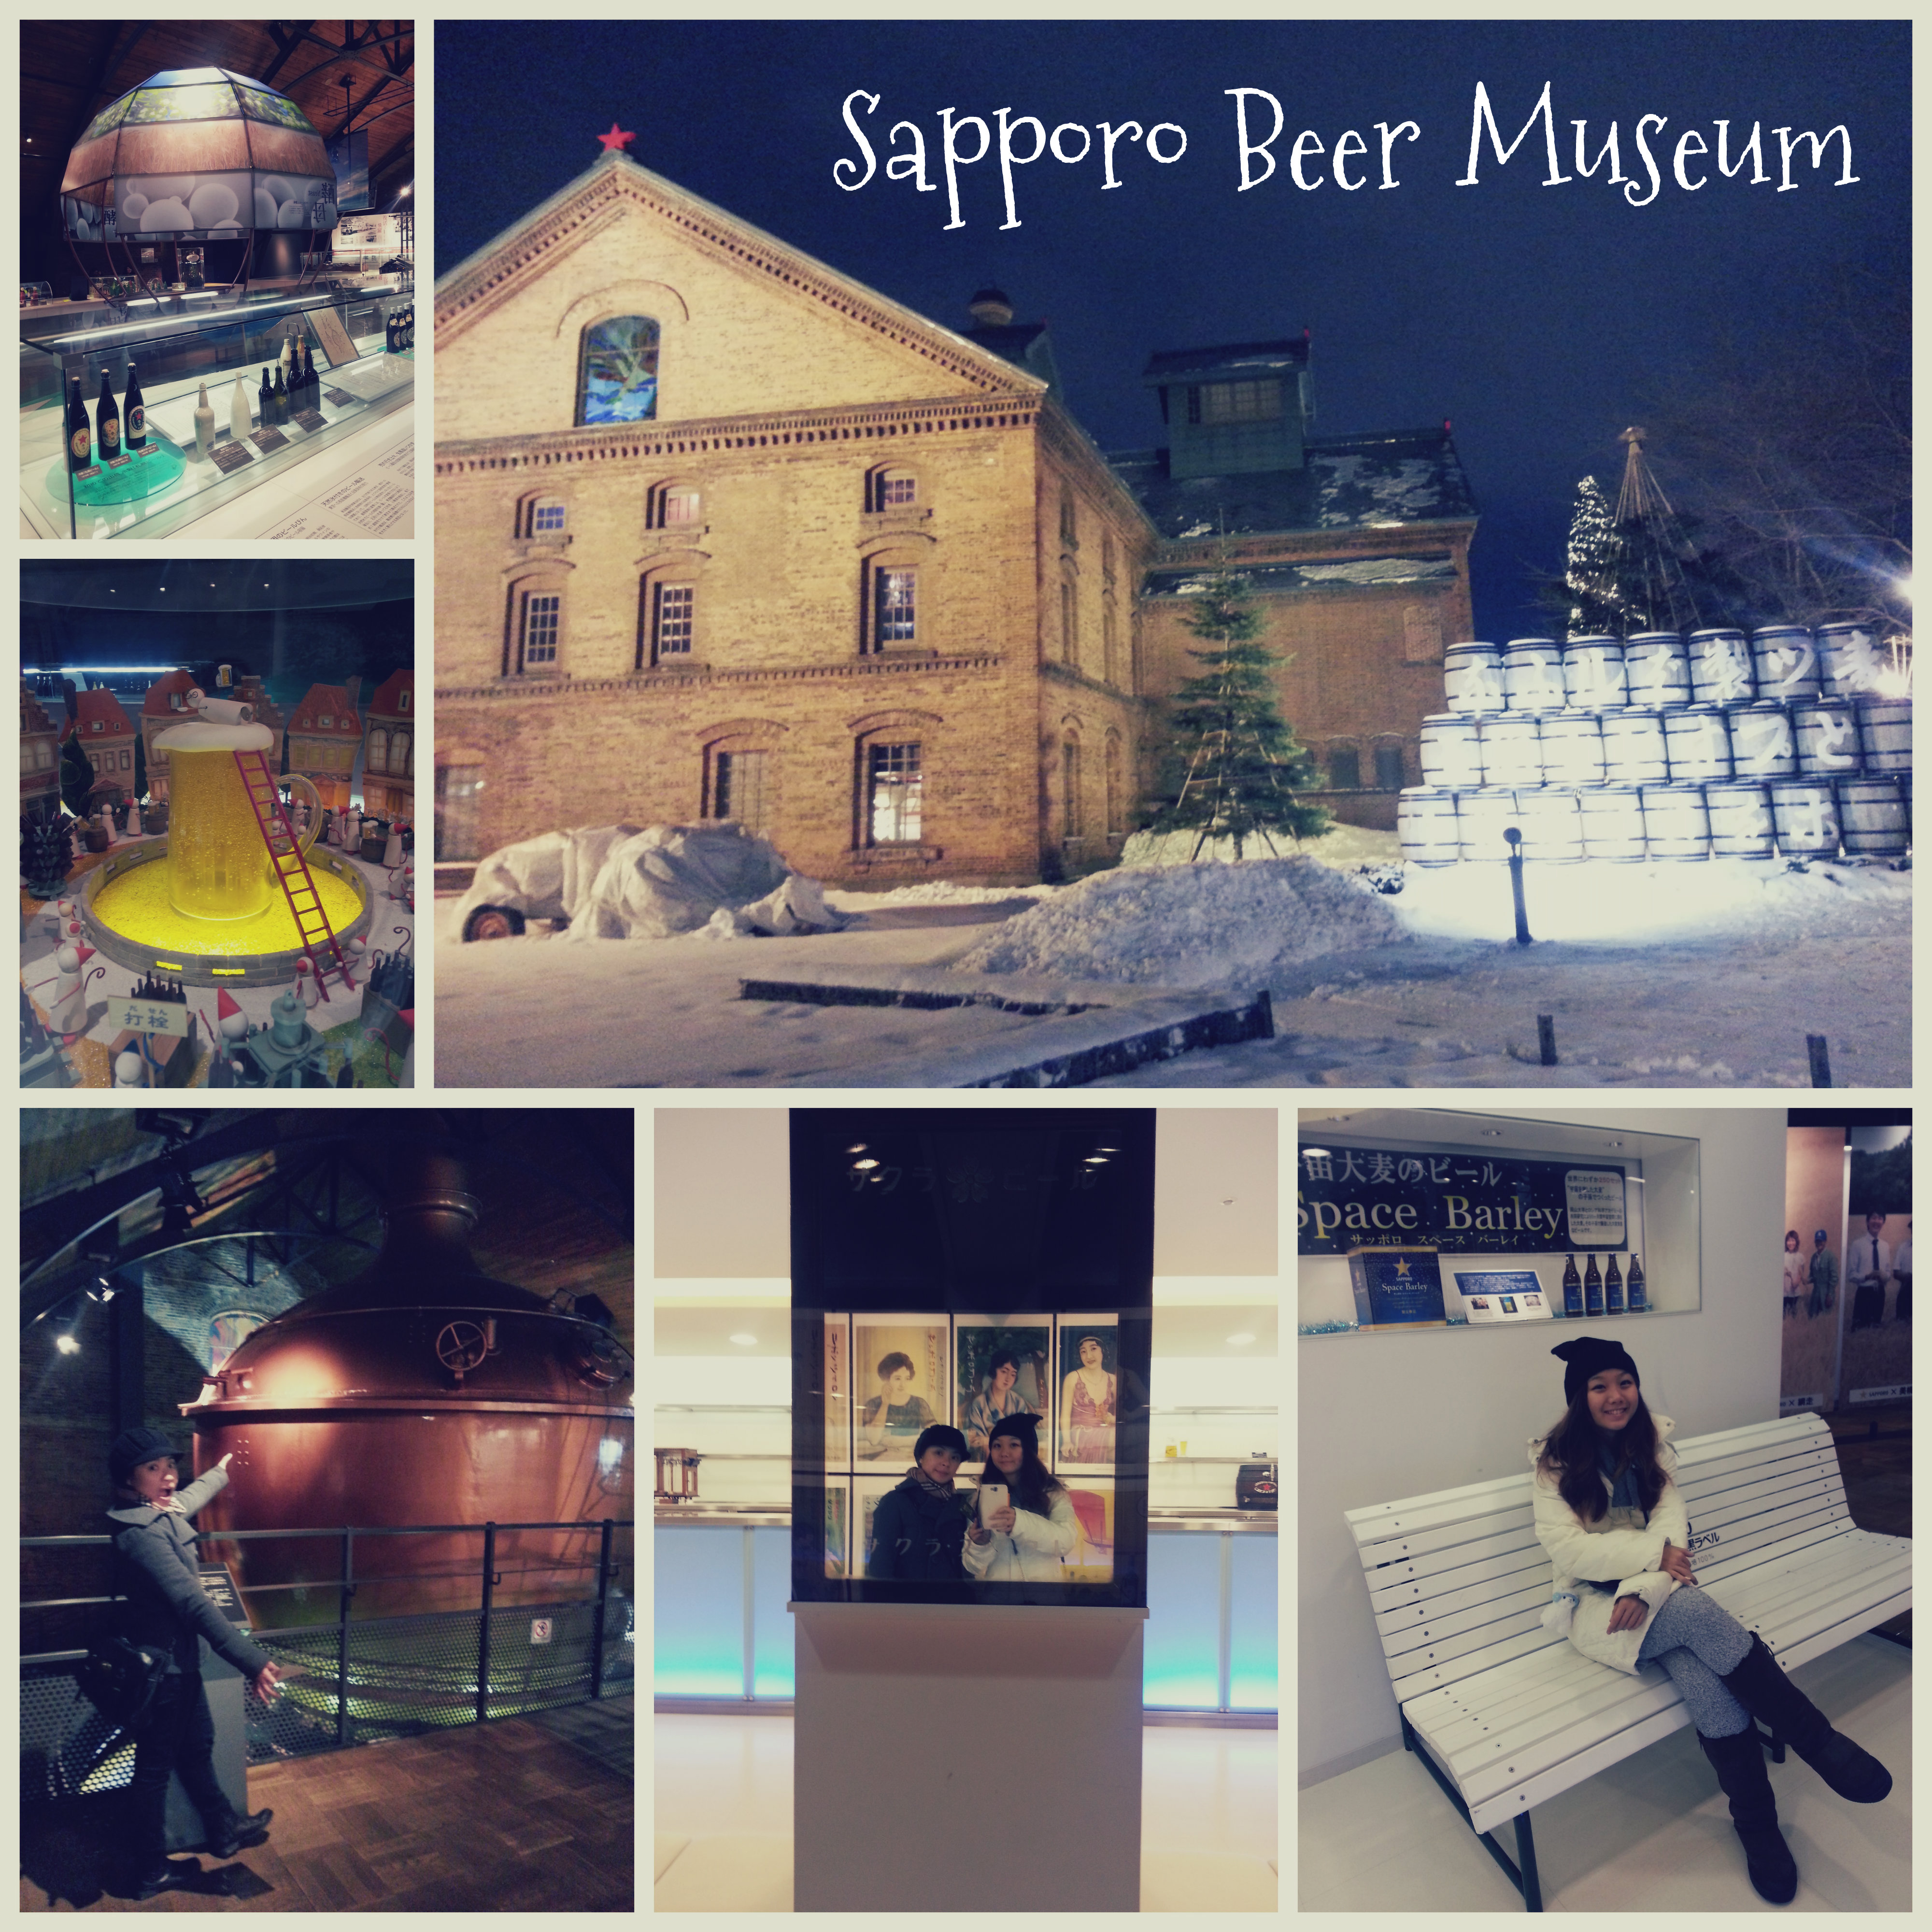 sapporo beer museum 2